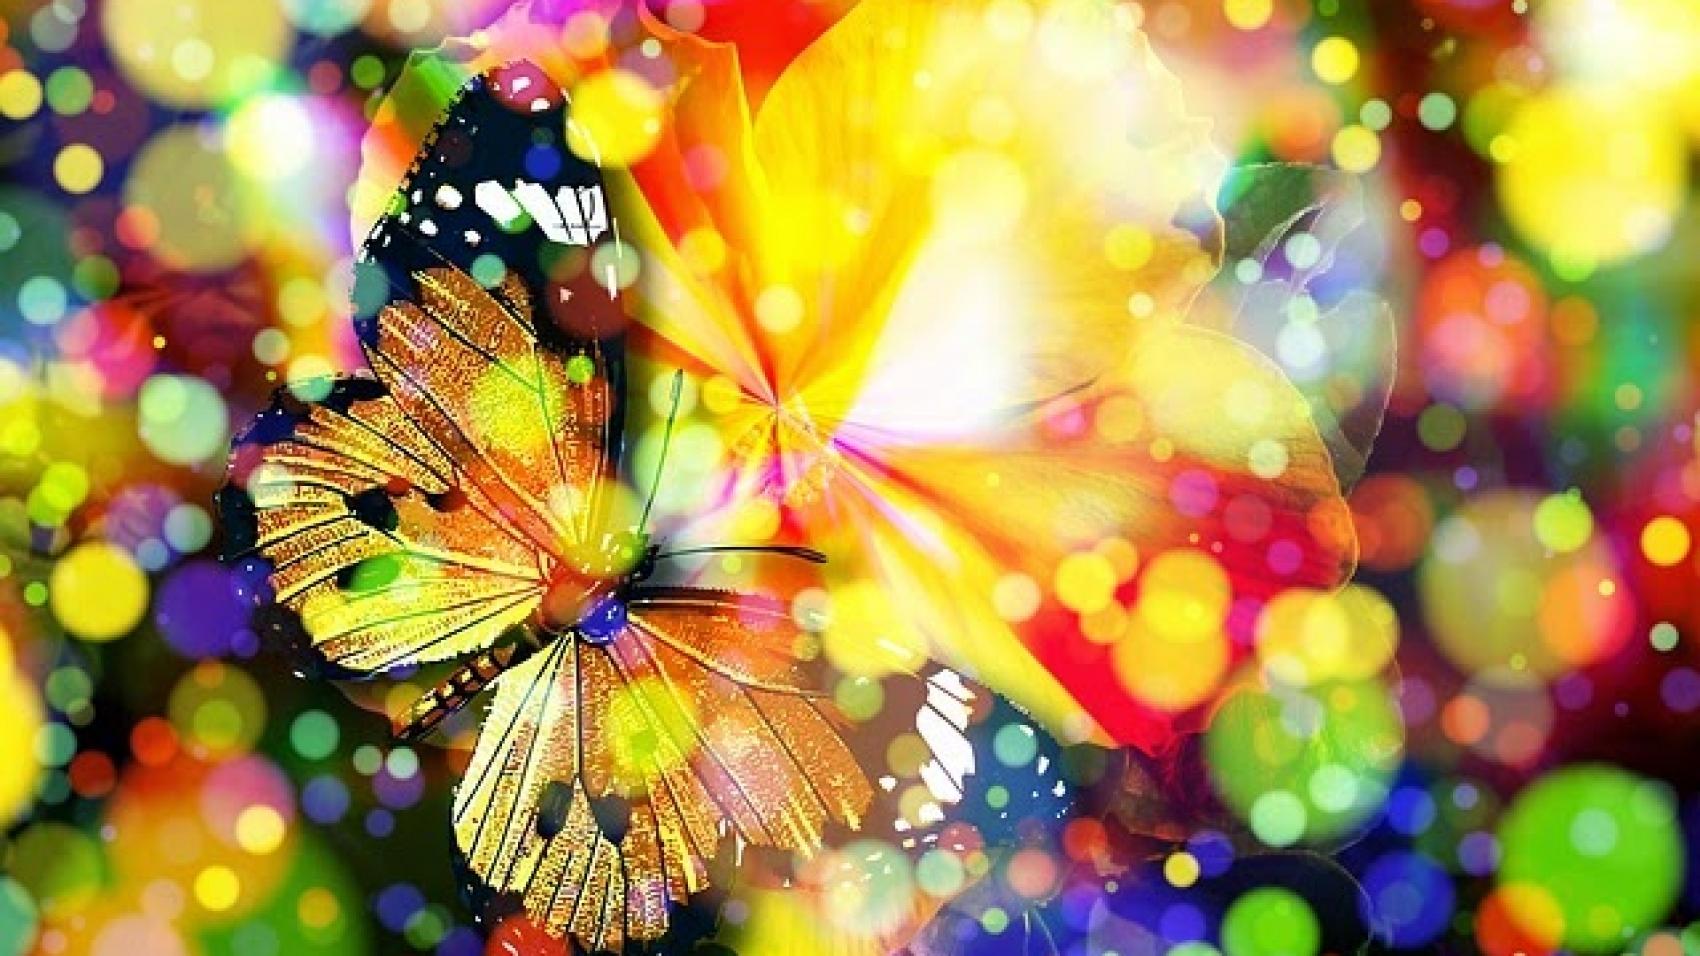 mariposa-magica-colores-textura.jpg